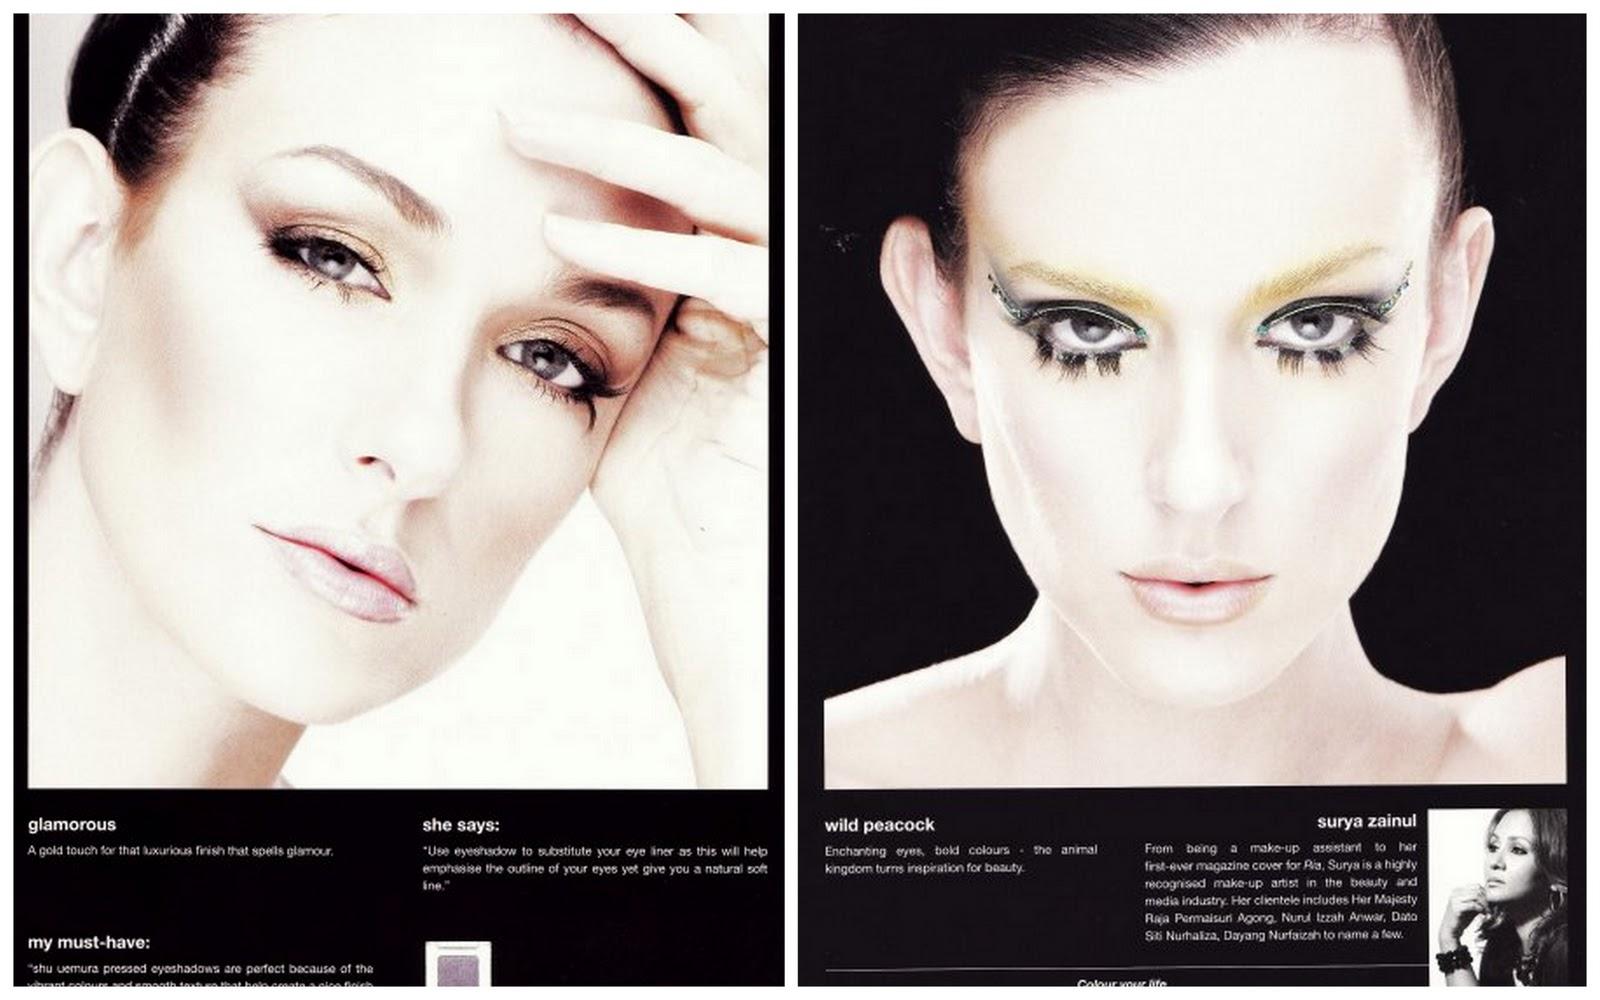 Surya zainul my collaboration with shu uemura thecheapjerseys Images